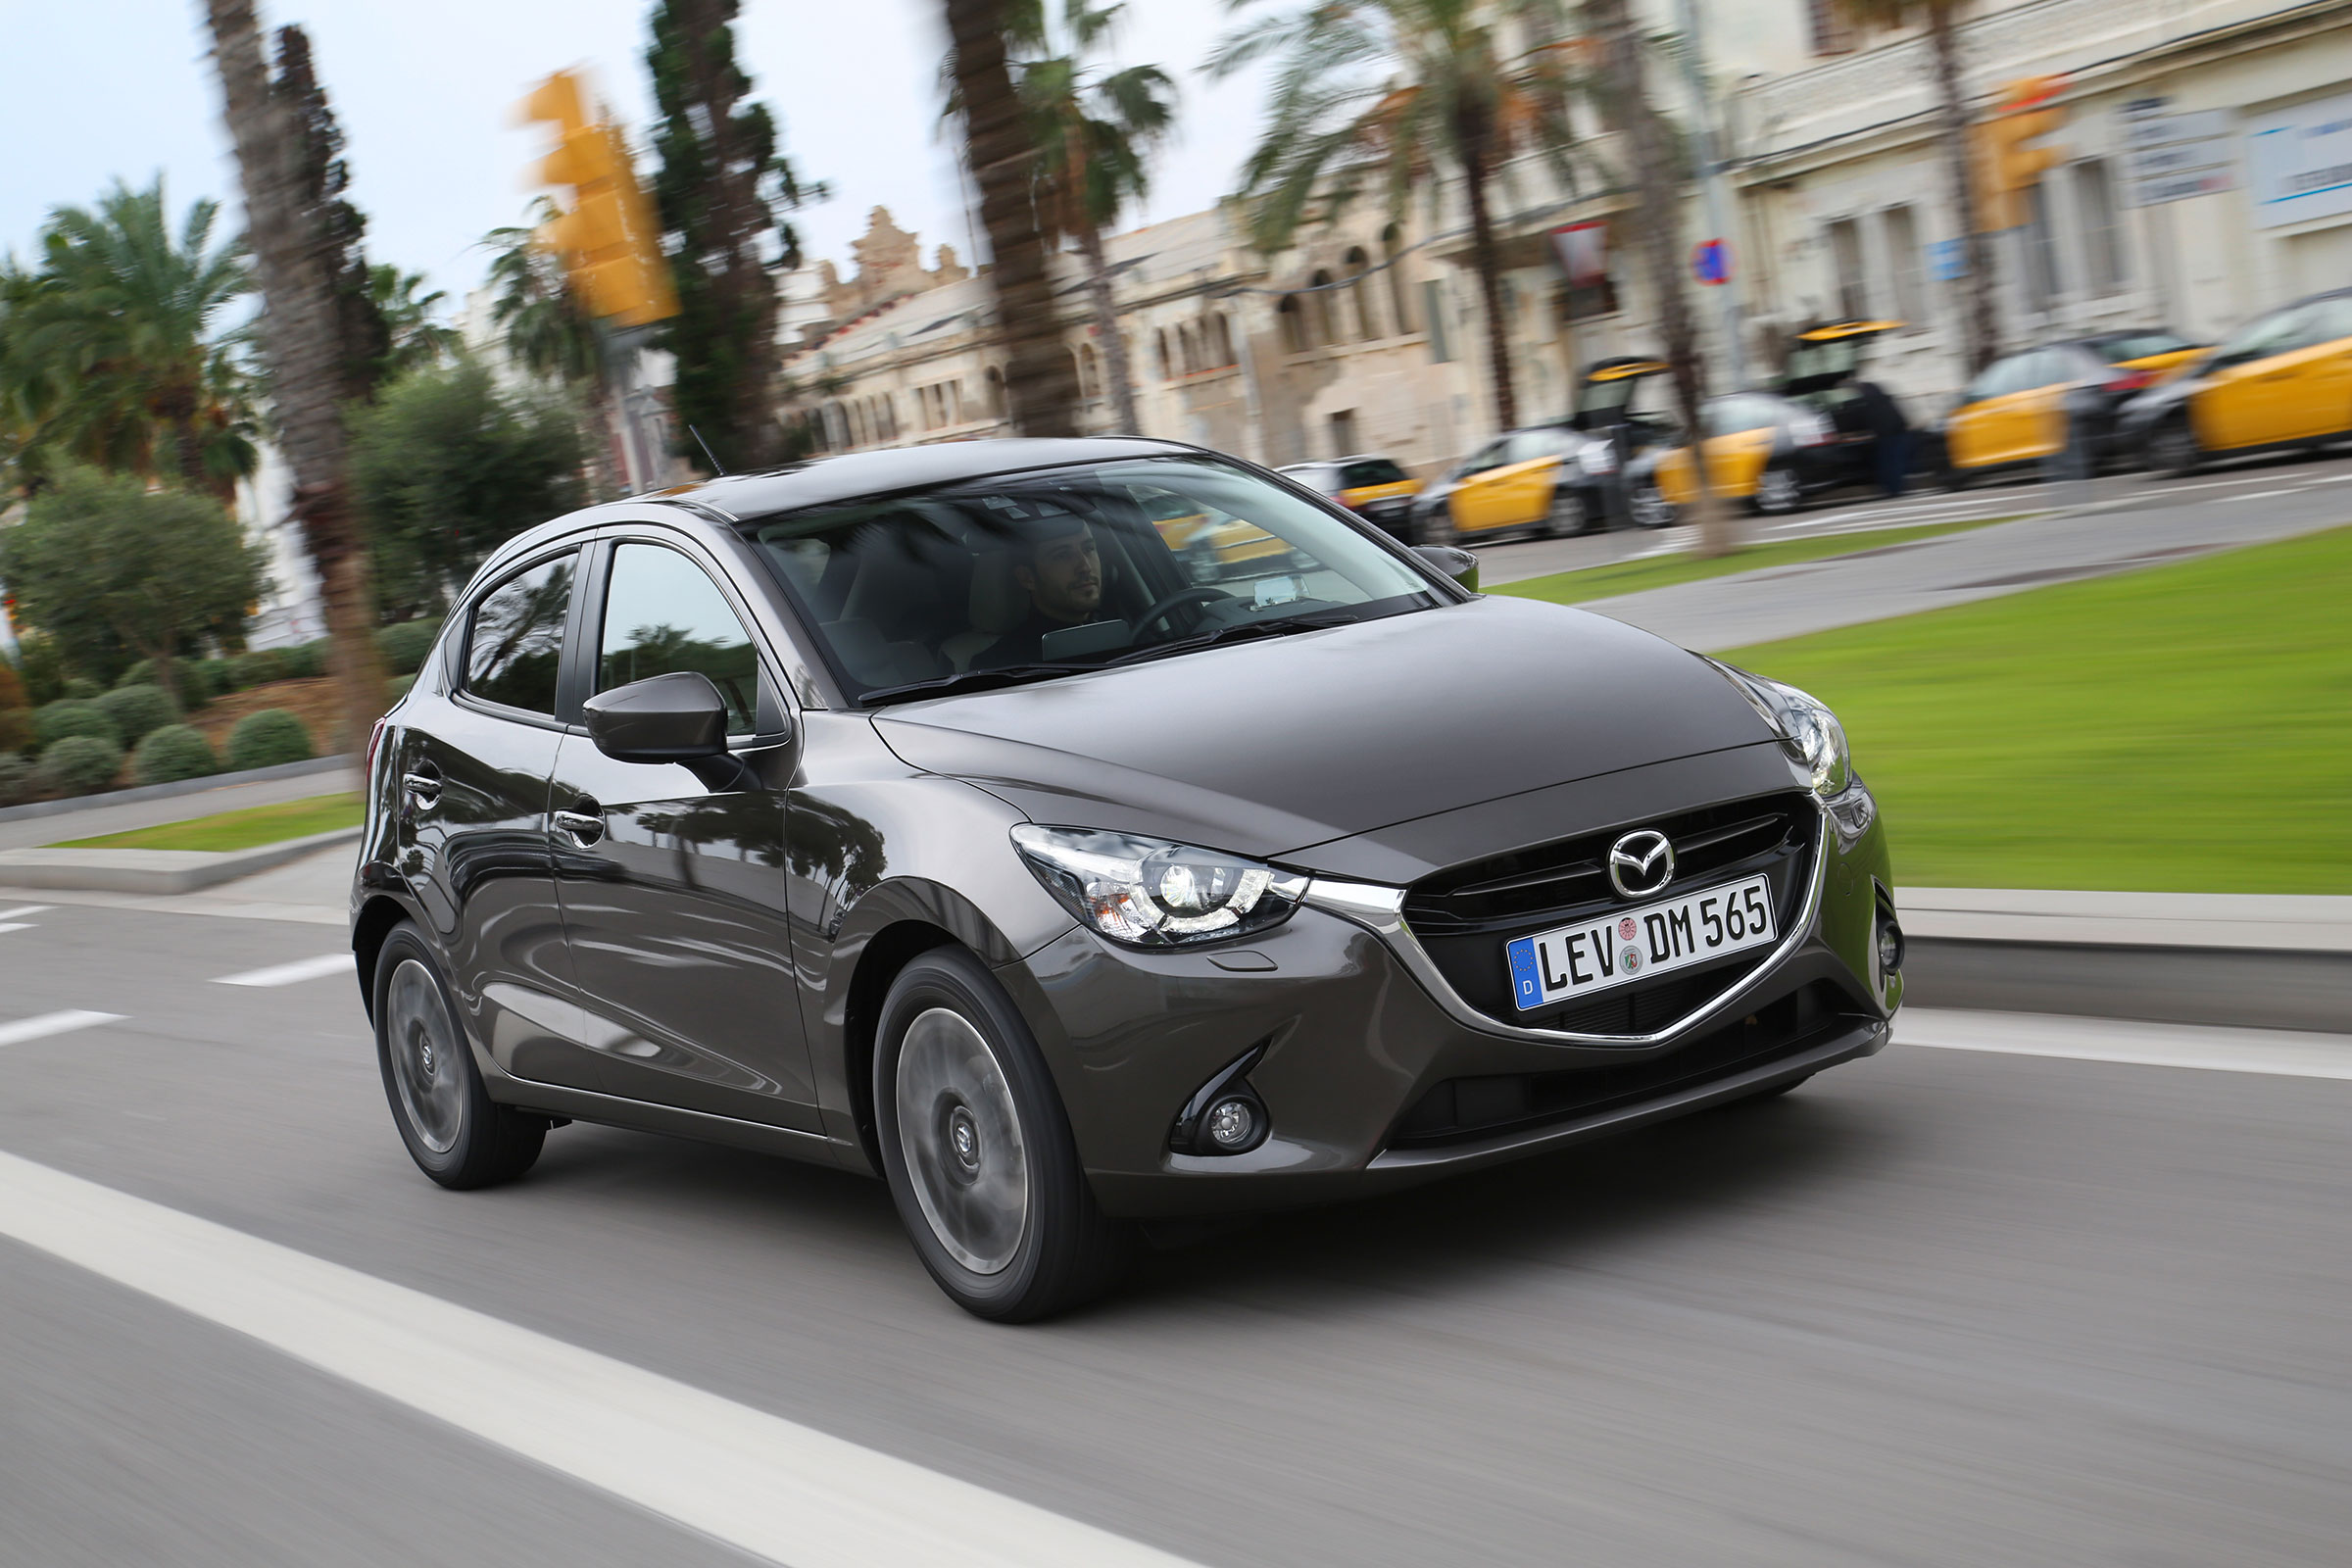 Kelebihan Mazda 2 Skyactiv Spesifikasi